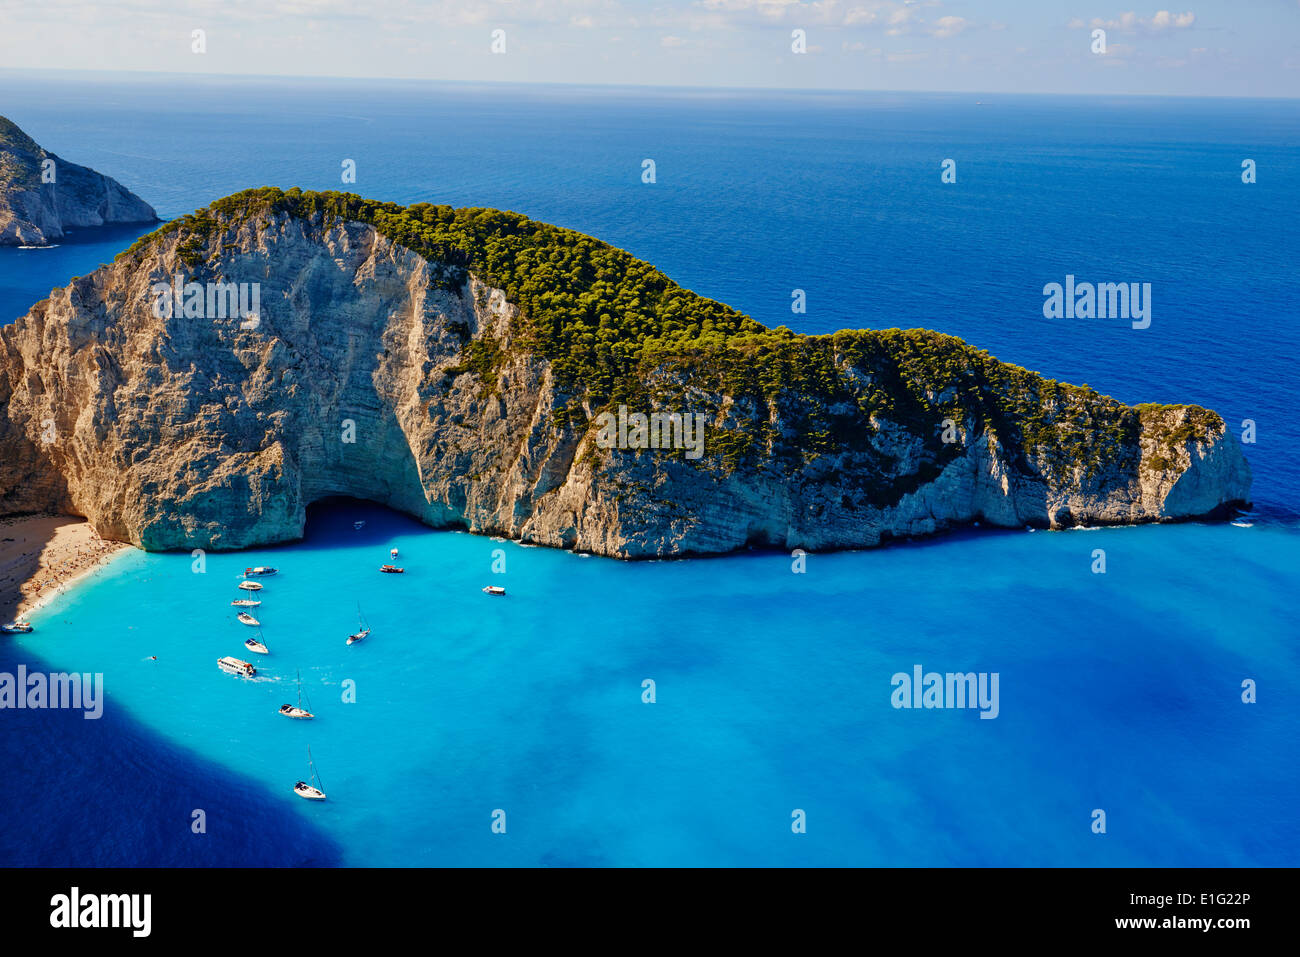 Greece, Ionian island, Zante island, Shipwreck beach - Stock Image